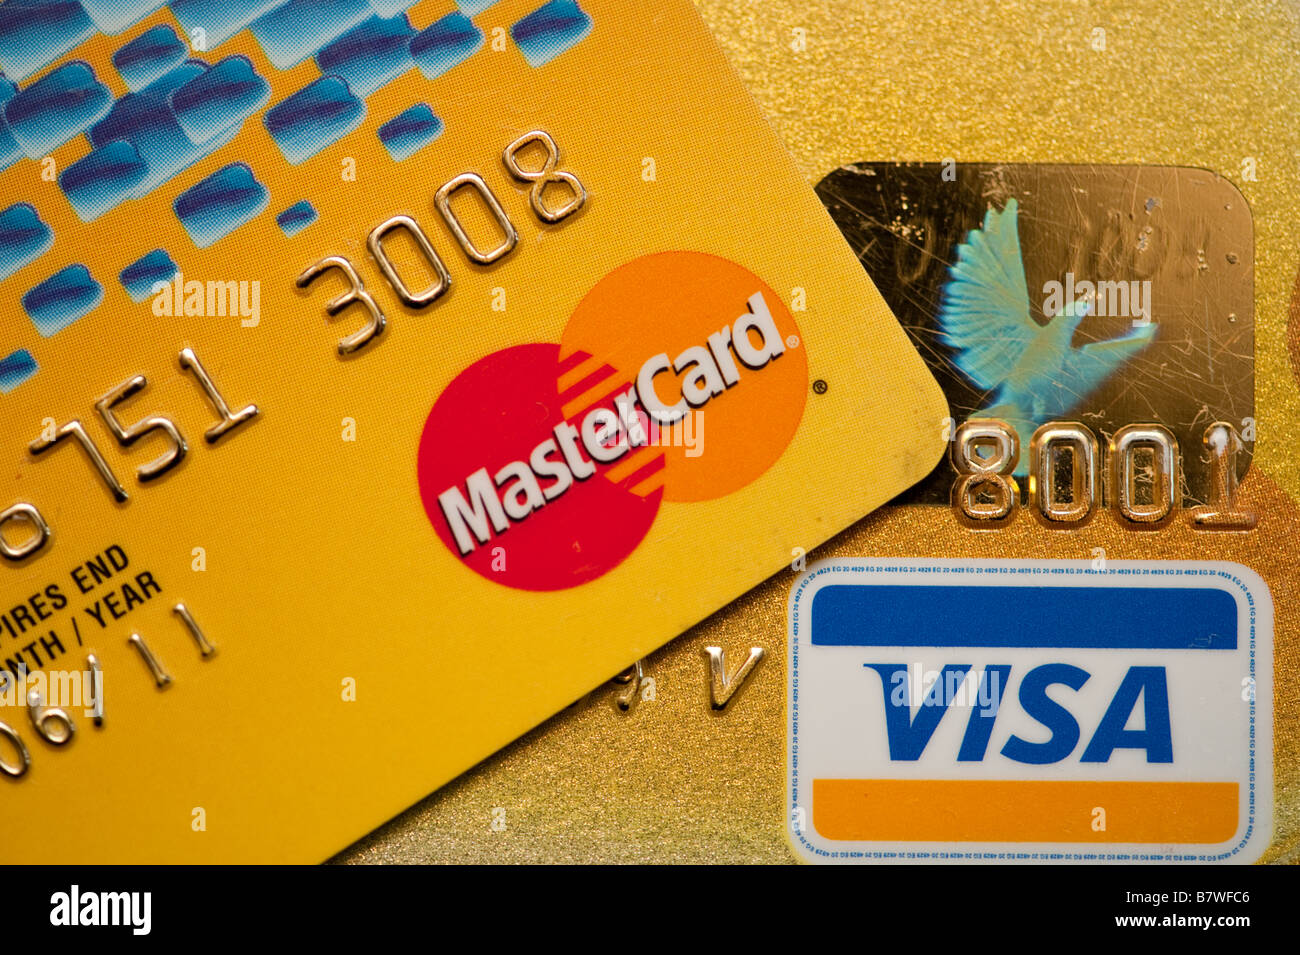 Mastercard and Visa credit cards - Stock Image